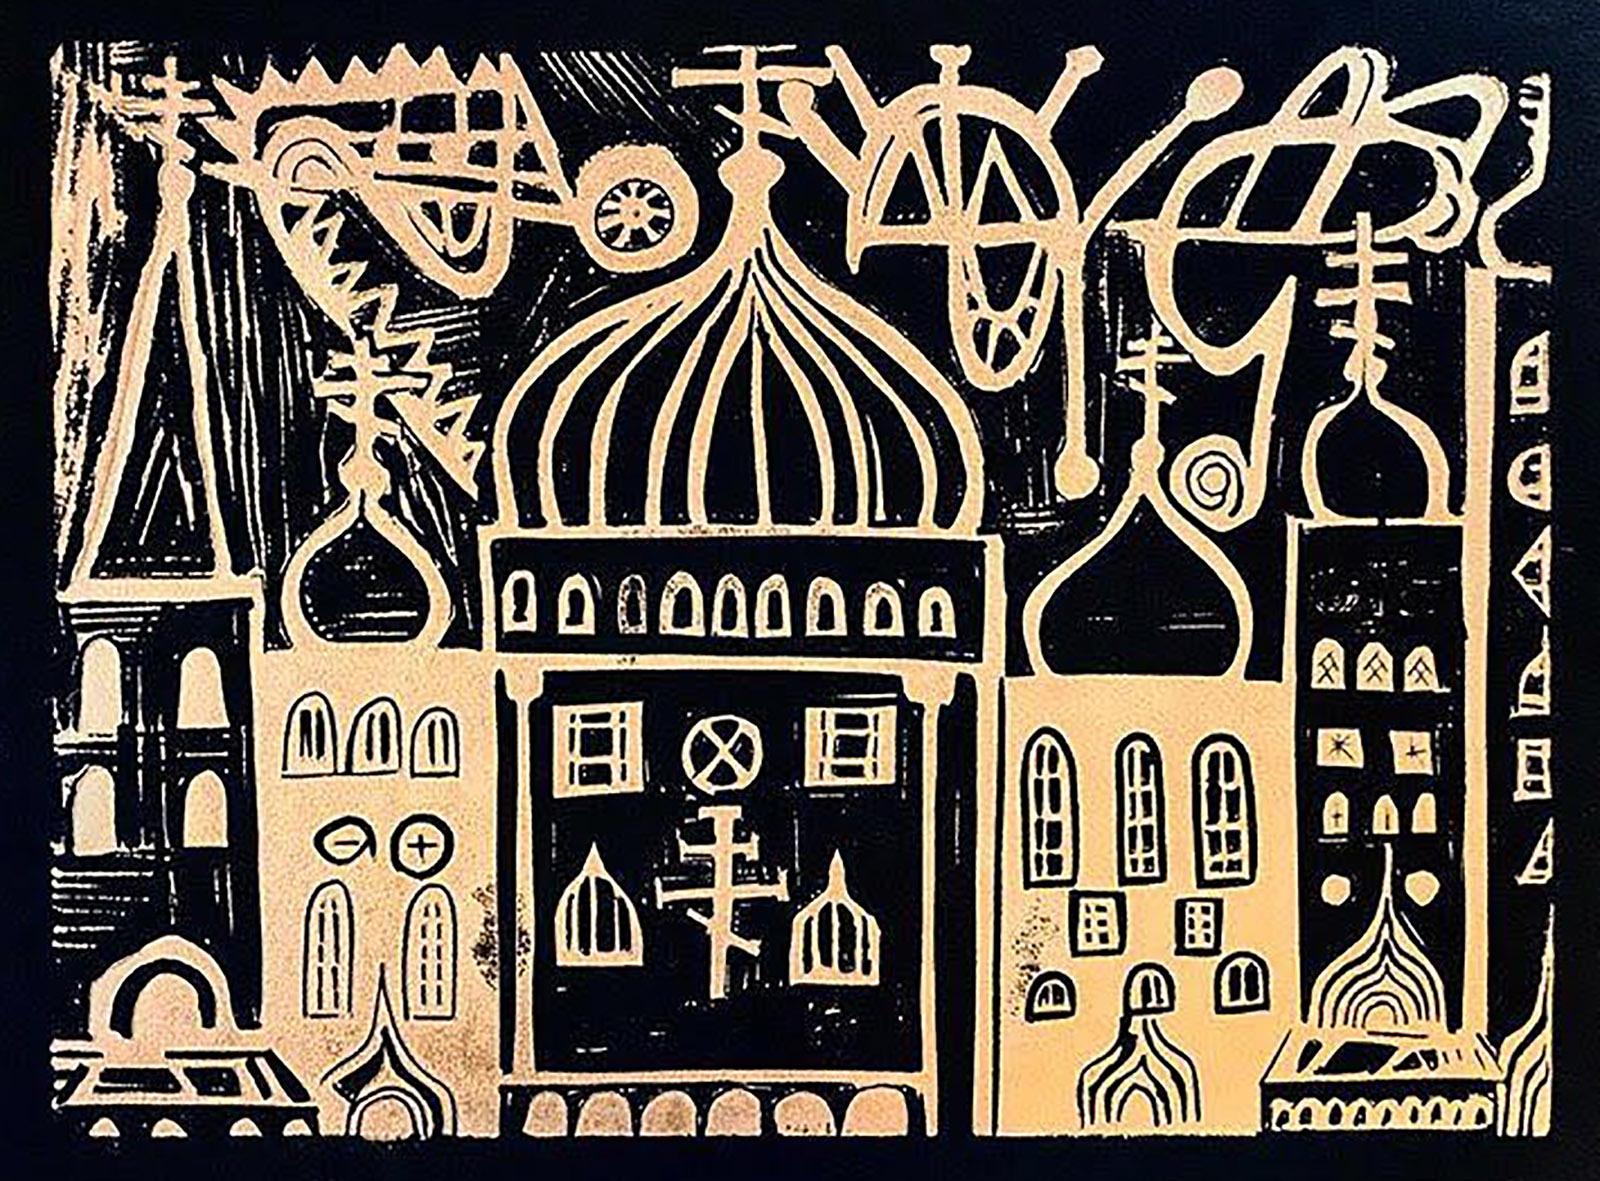 30. Misha Lino Print of Churches